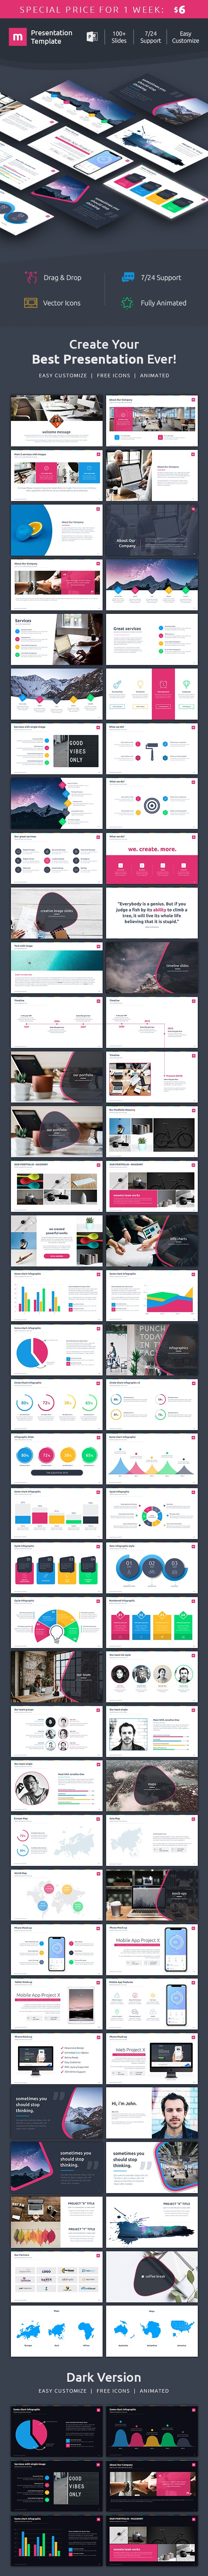 Moneta Powerpoint Template - Creative PowerPoint Templates